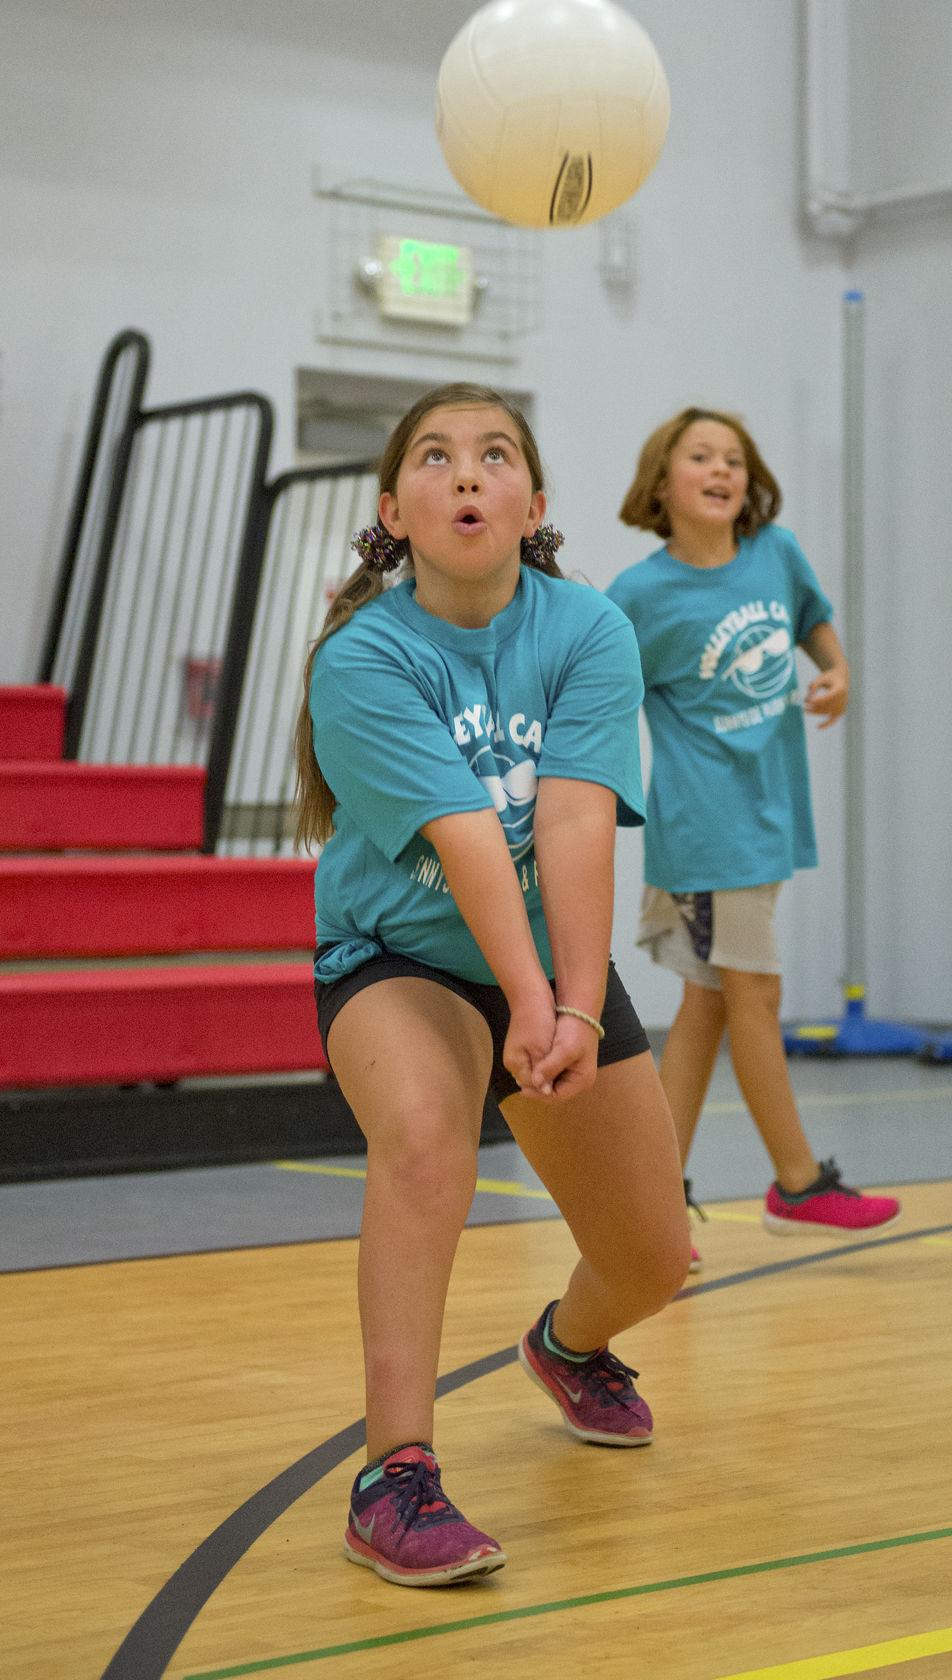 08_21_Sunnyside Park_Rec Volleyball Camp Photo_Taylor Hazzard.jpg